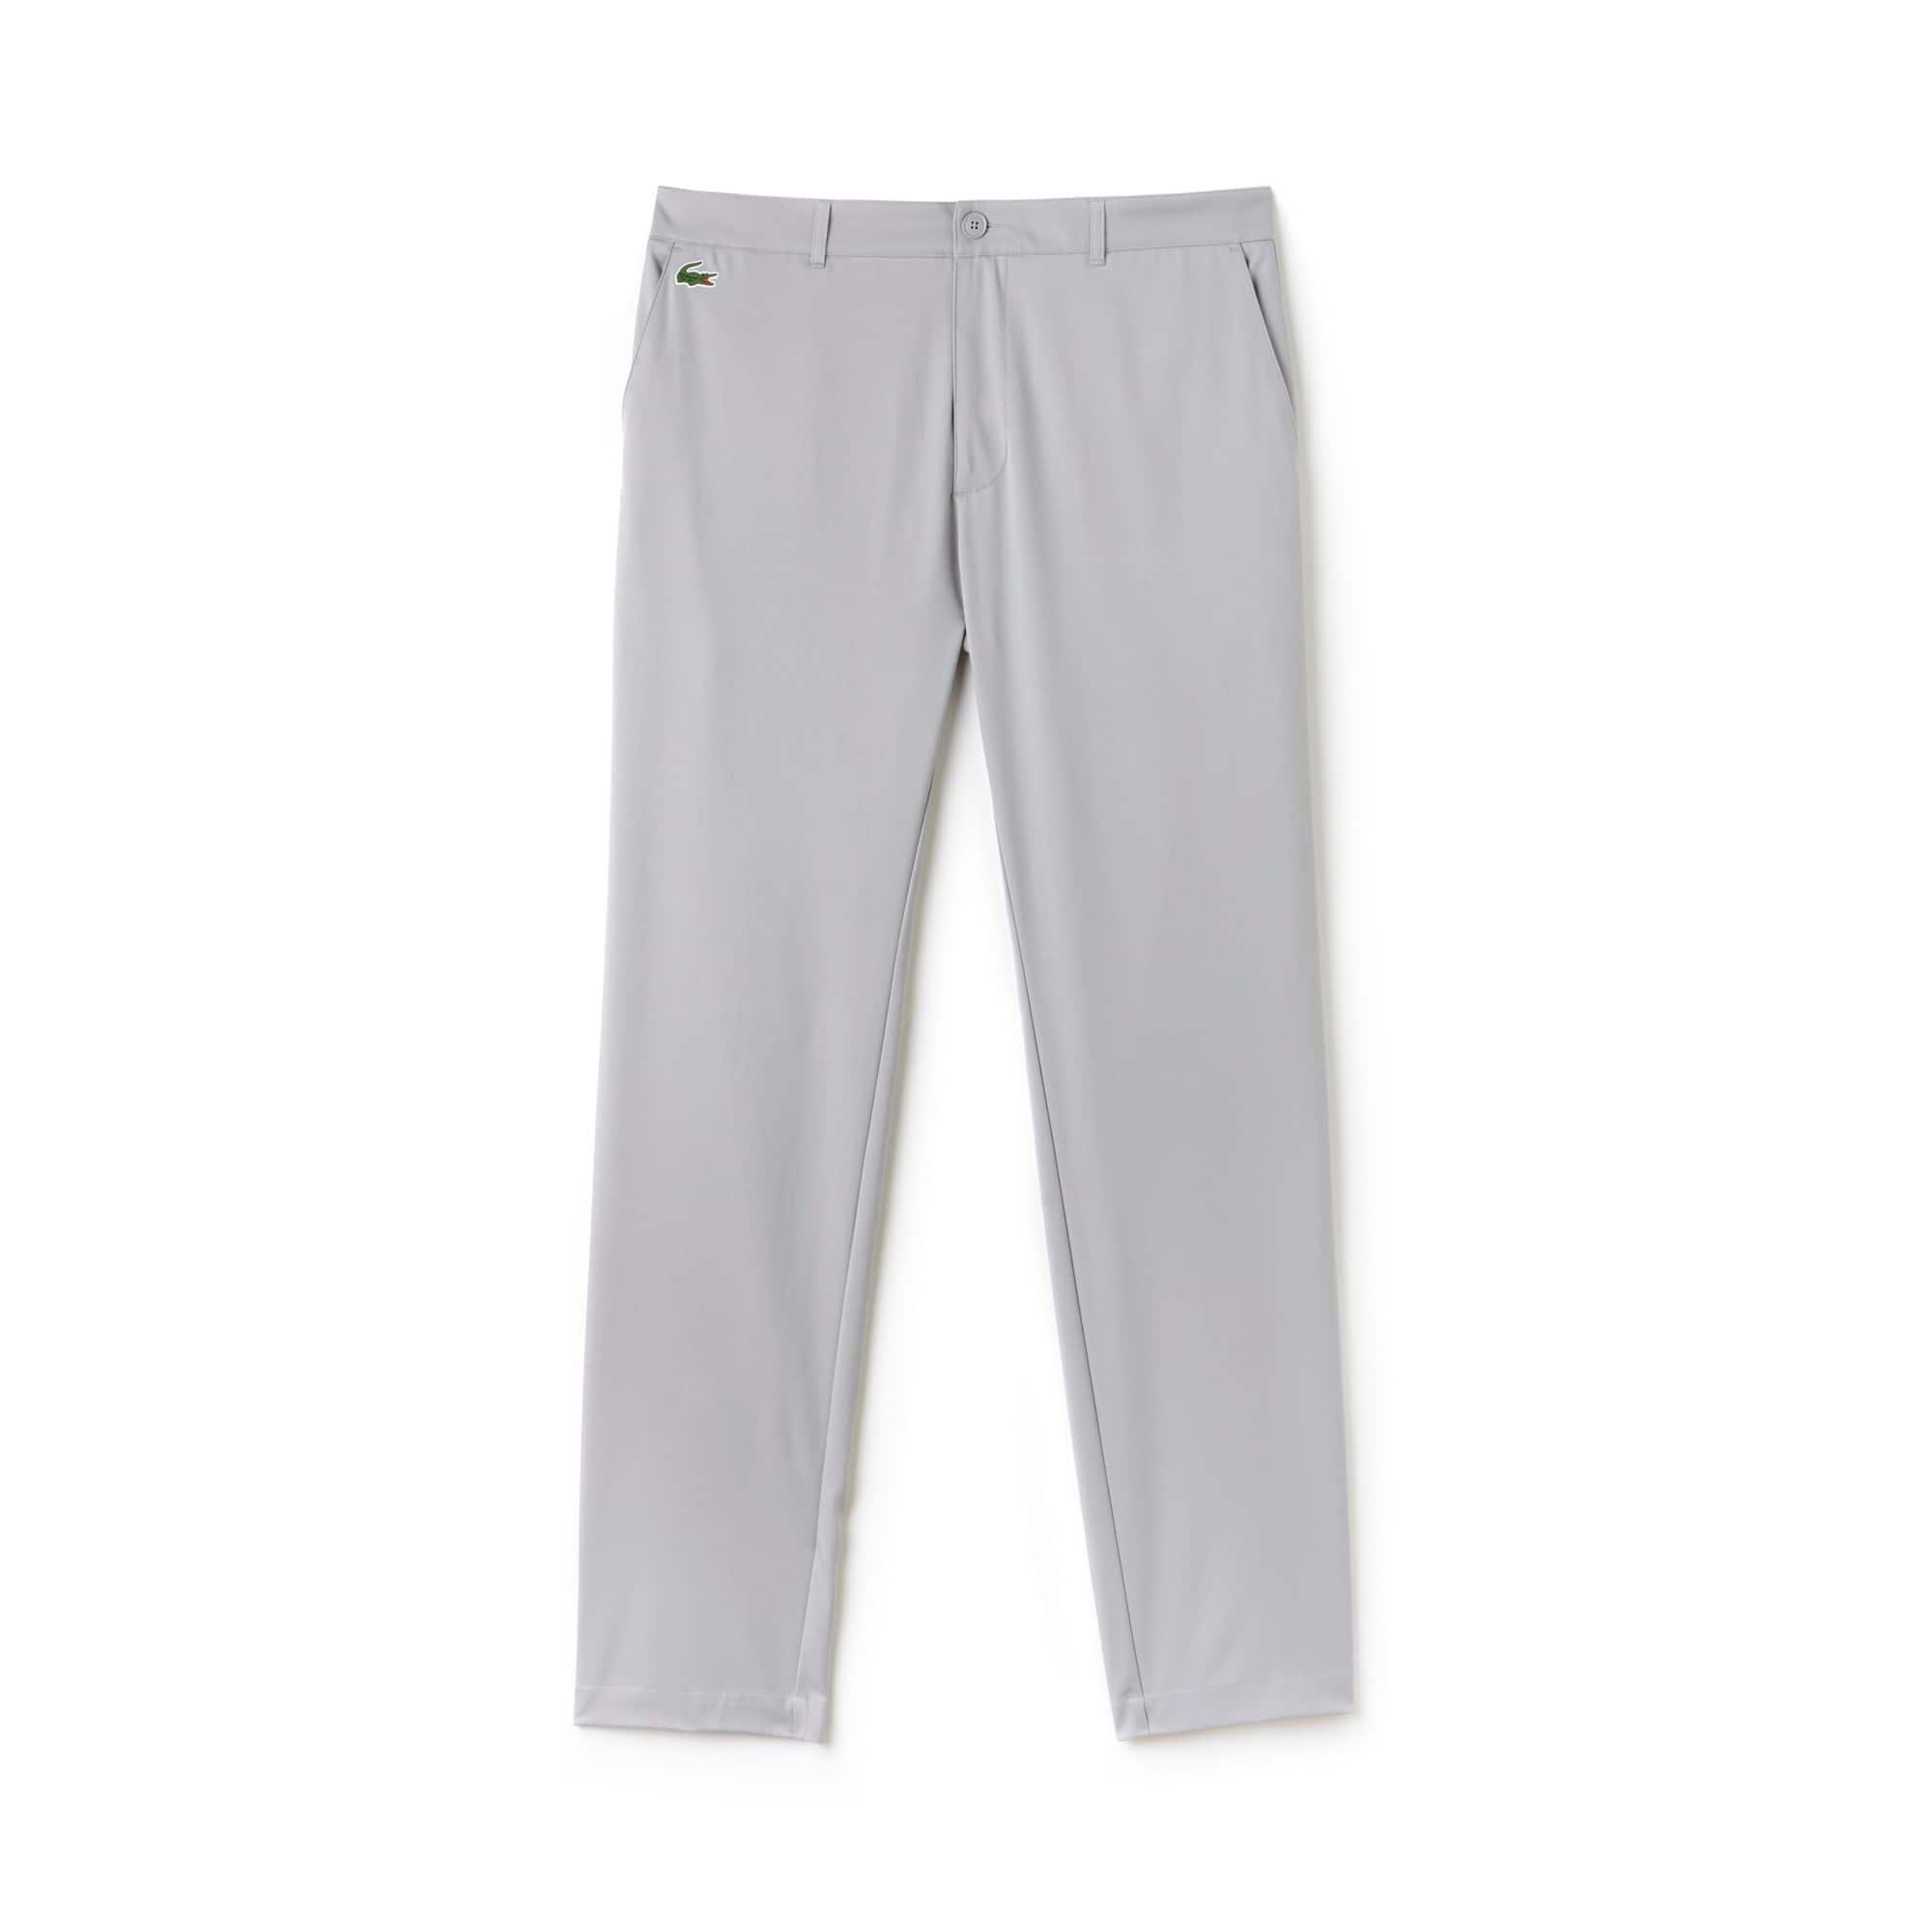 Men's SPORT Technical Golf Pants